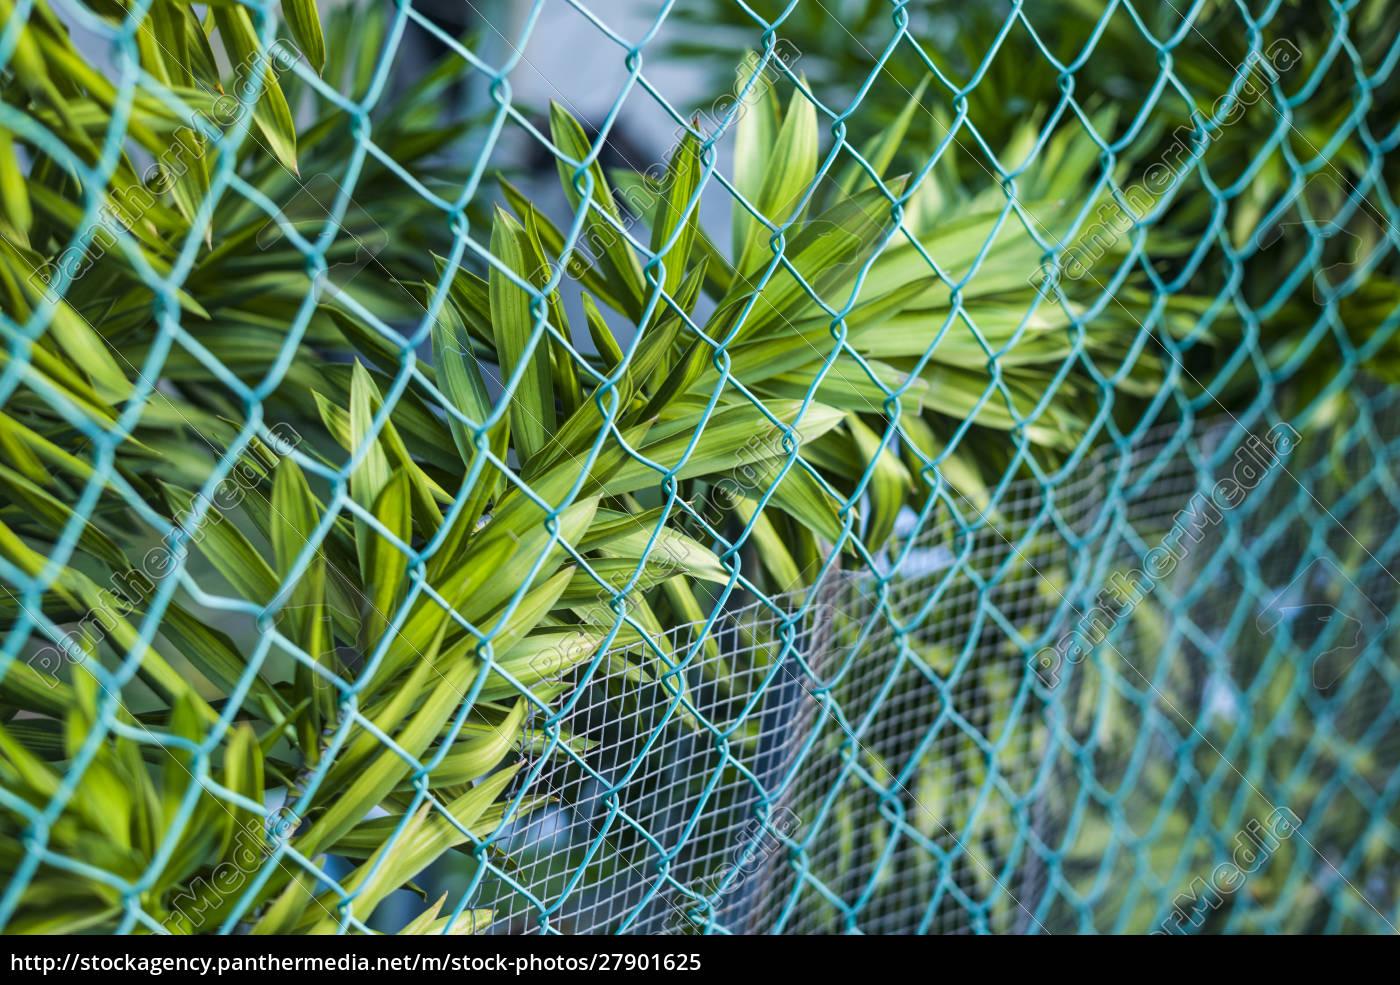 sint, eustatius., oranjestad, tropische, pflanzen - 27901625